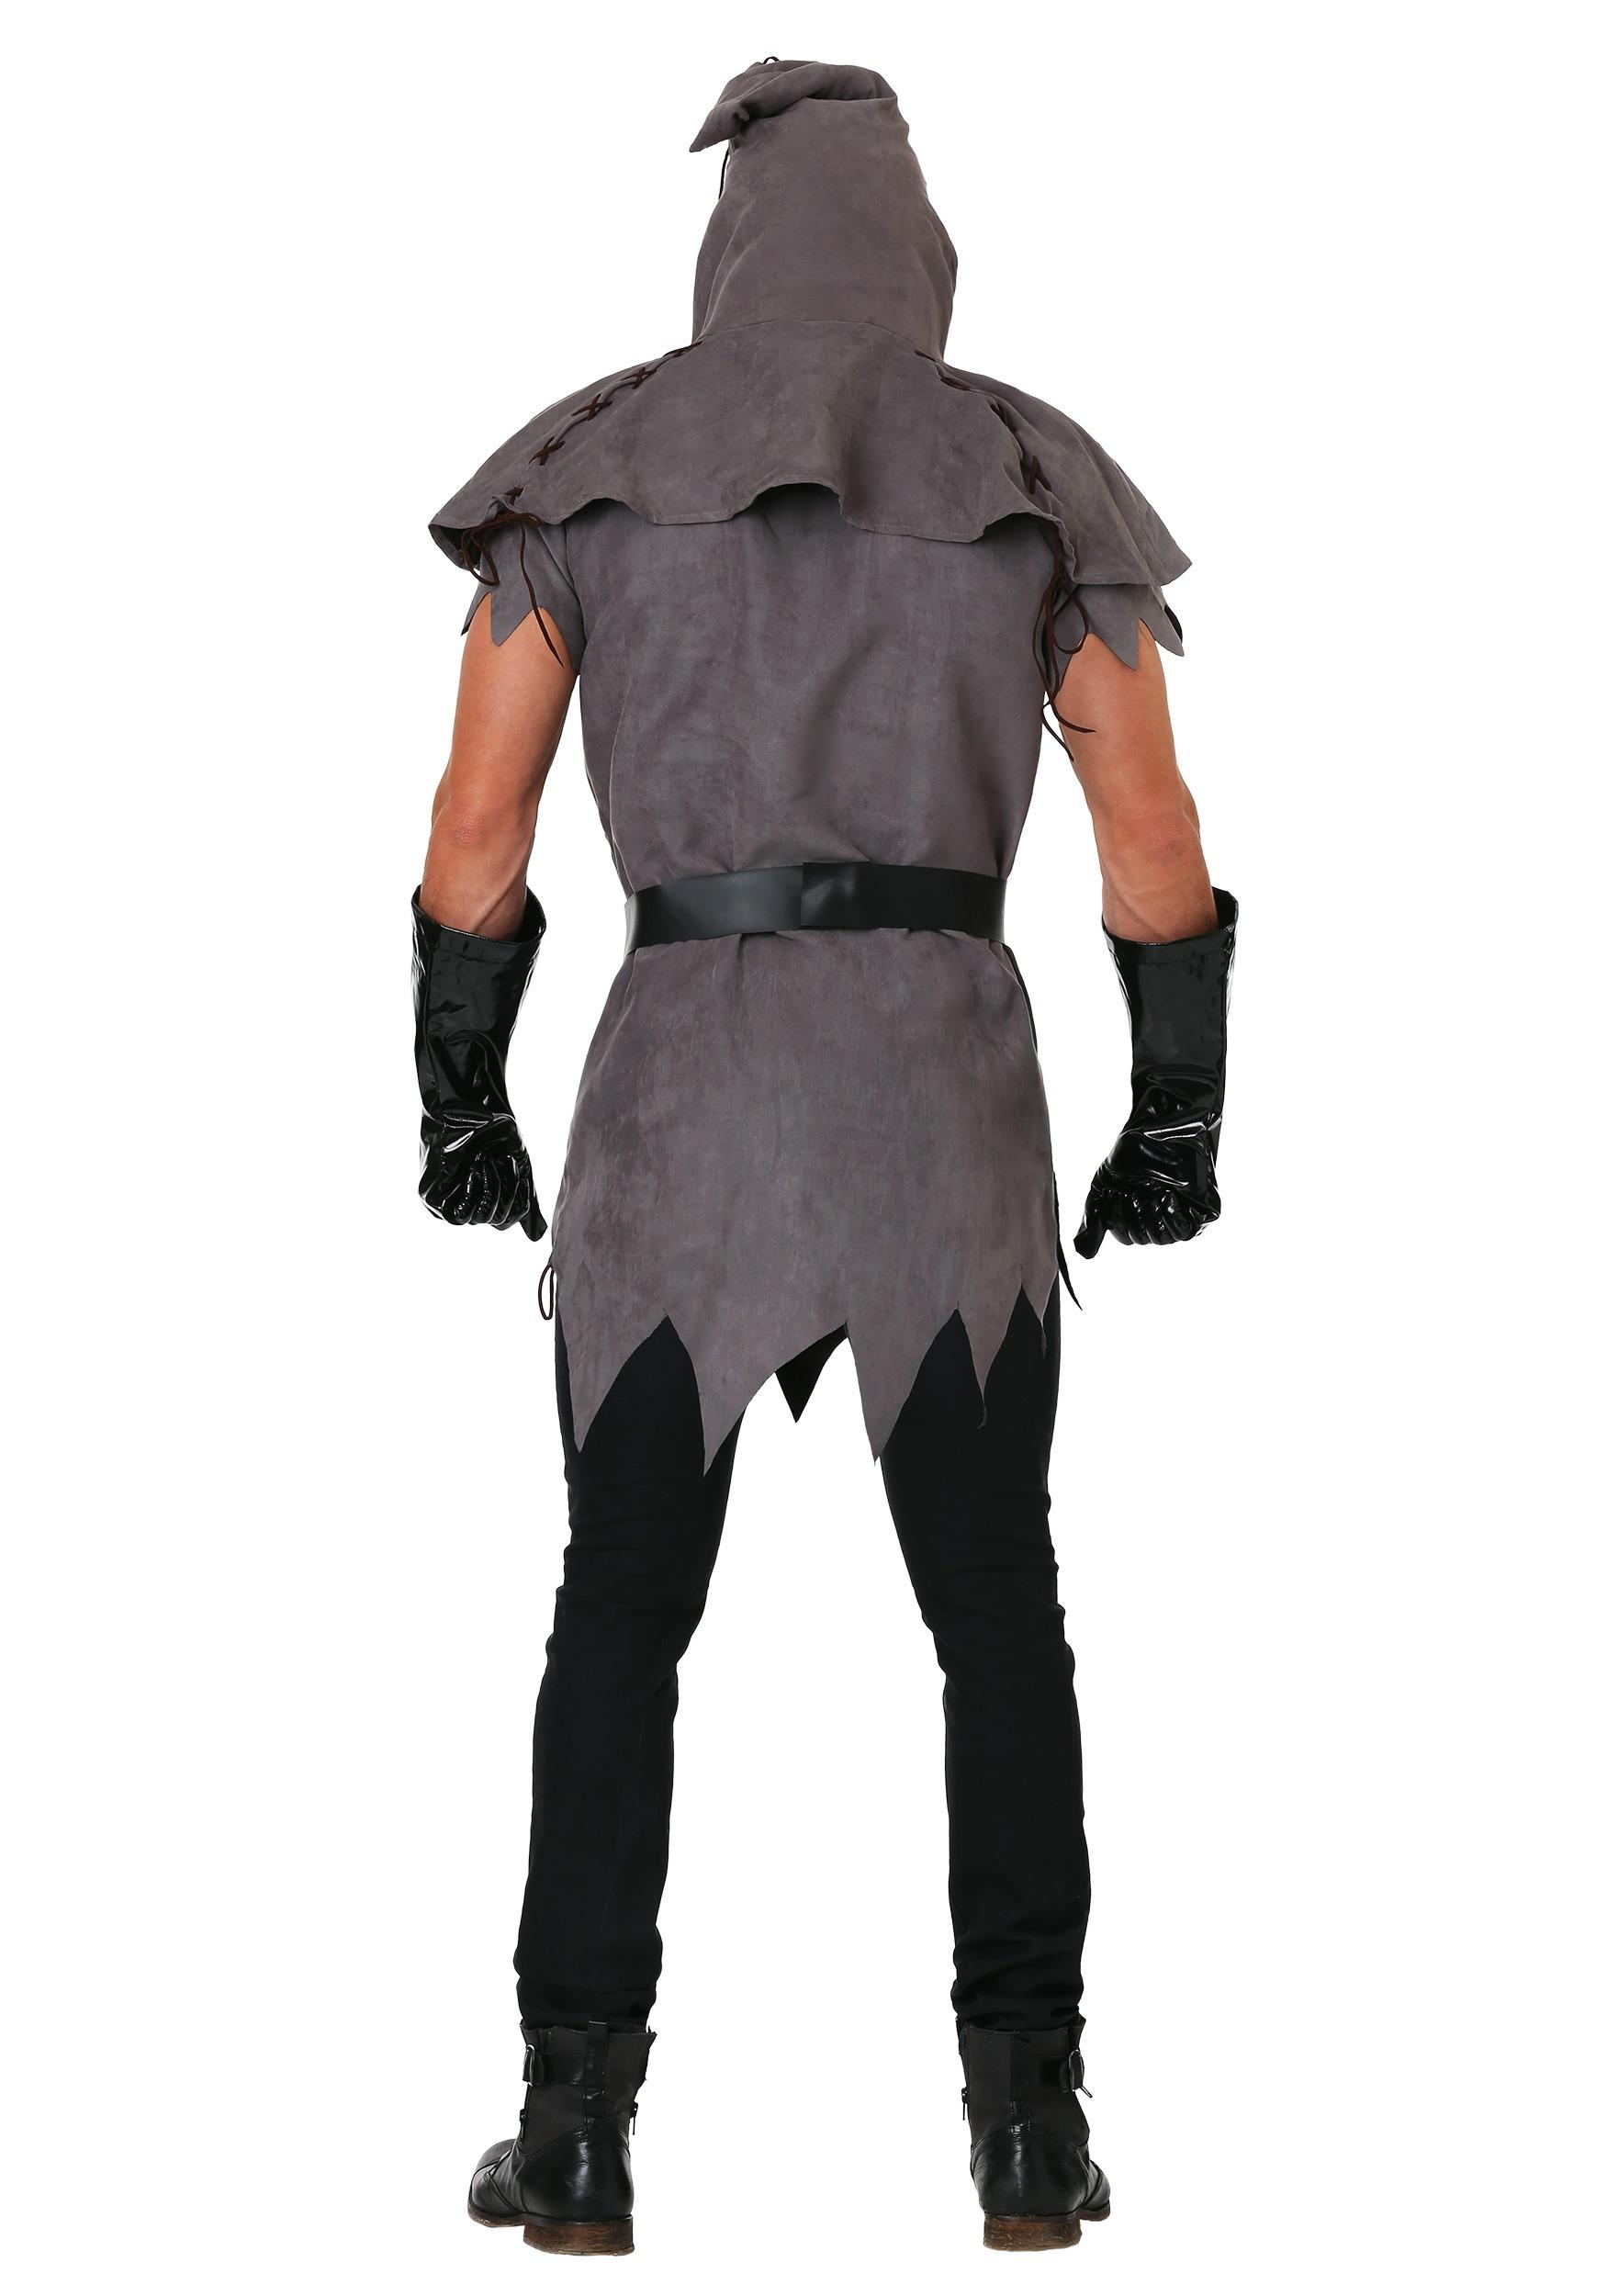 EXECUTIONER Plus Size Men/'s Costume Medieval Renaissance Scare Horror Halloween